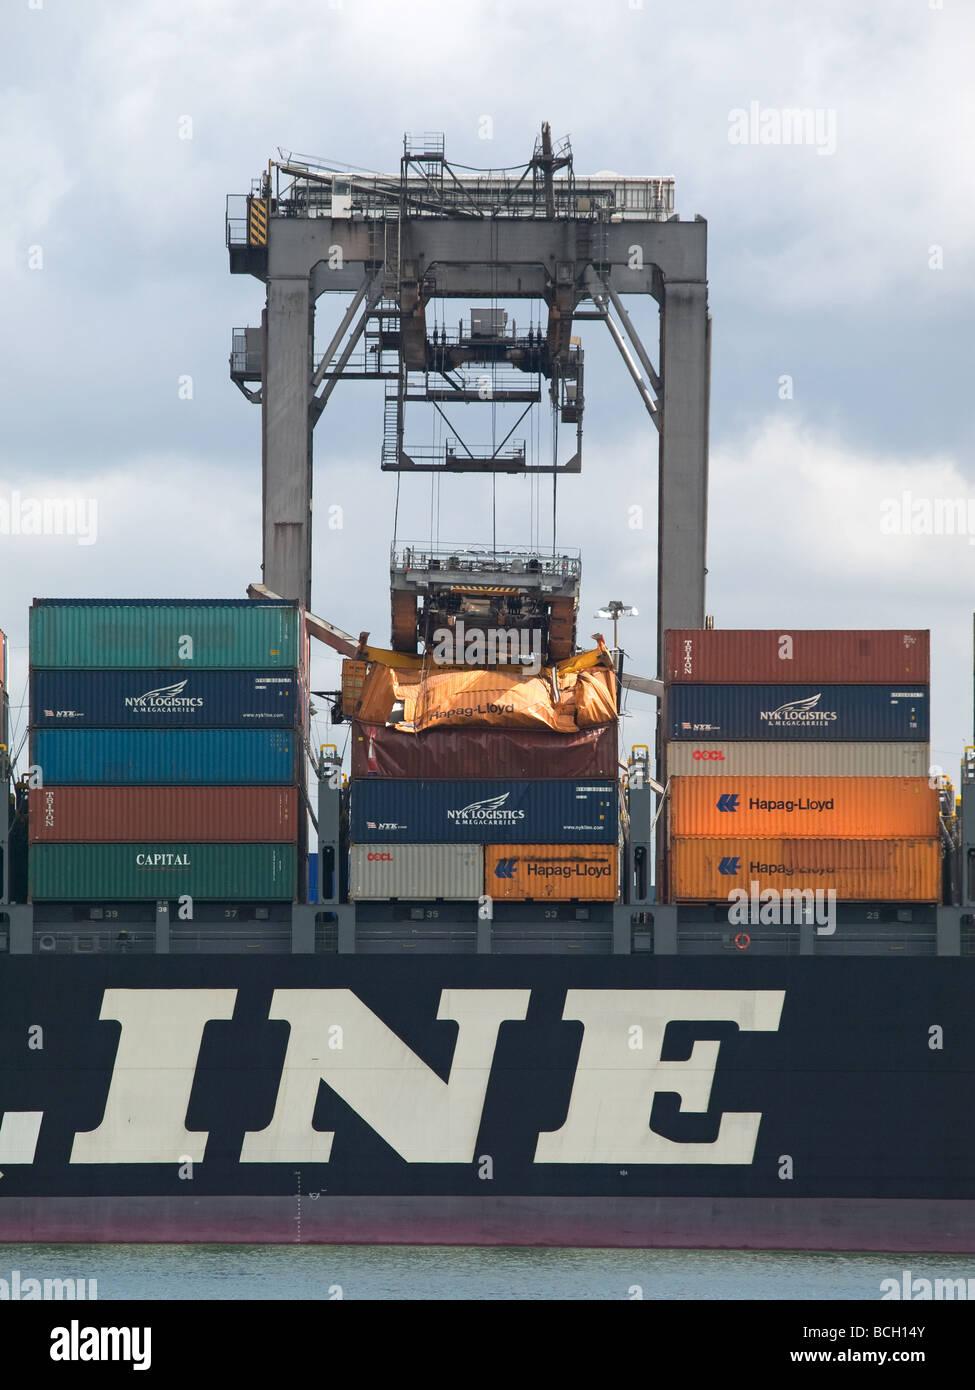 gantry-crane-boom-collapsed-onto-contain